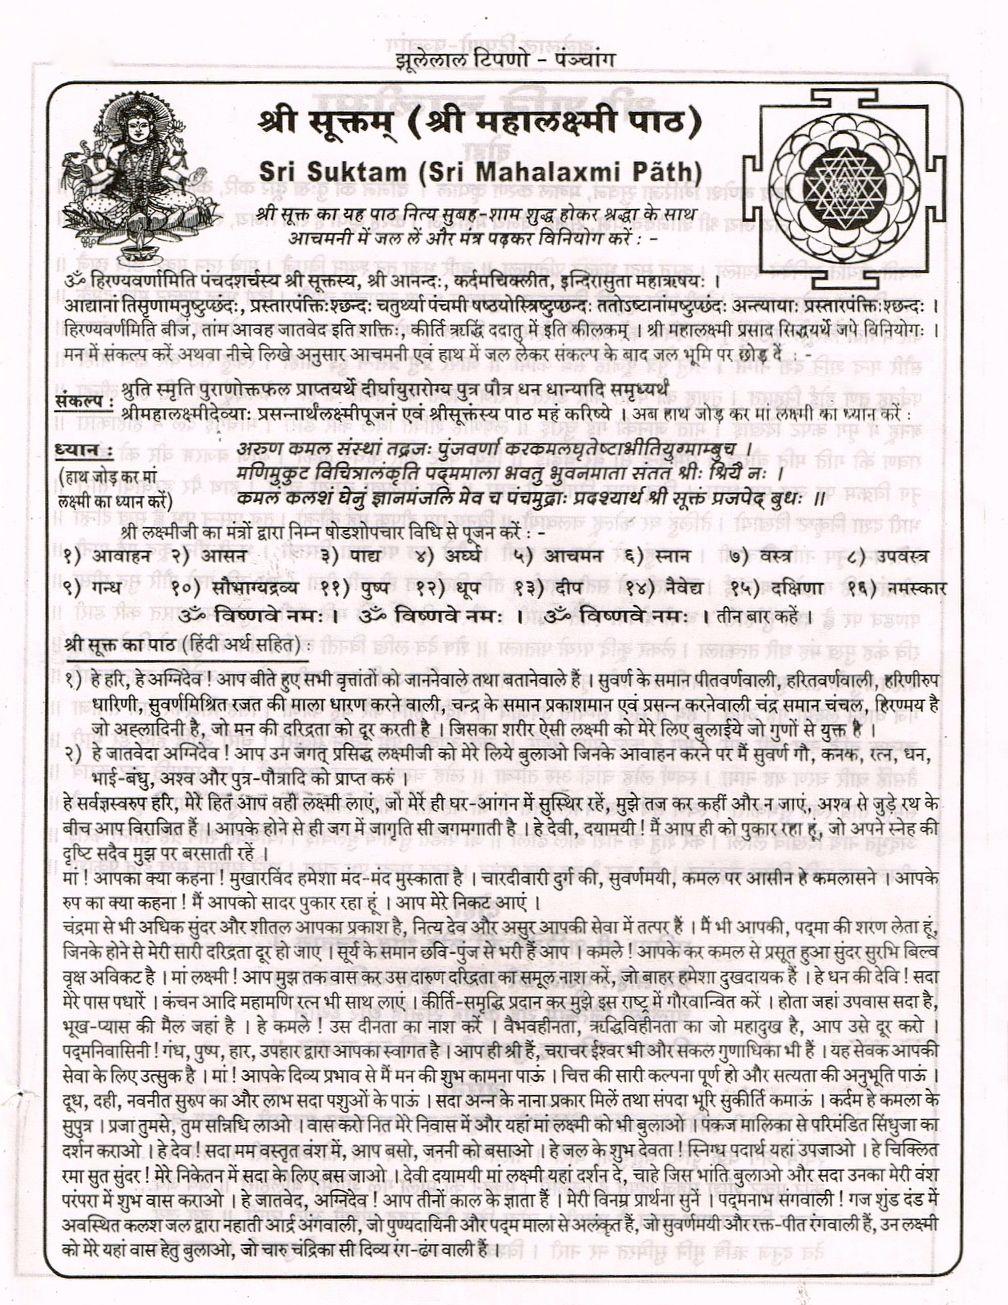 Sri Suktam (Sri Mahalaxmi Path) Hindi   Laxmi Pooja (Lakshmi), Sri ...